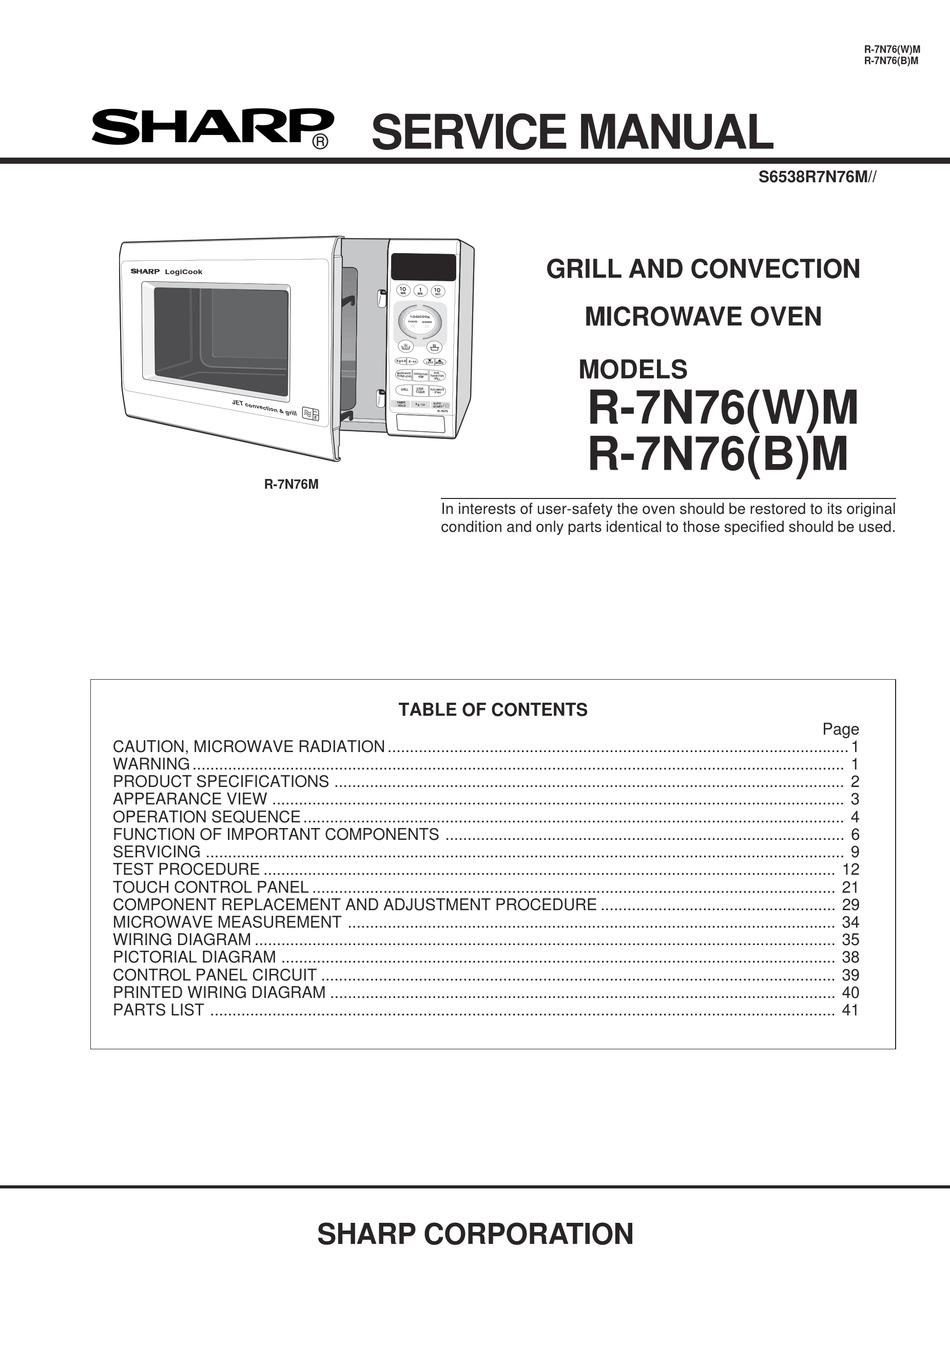 sharp r 7n76 b m service manual pdf